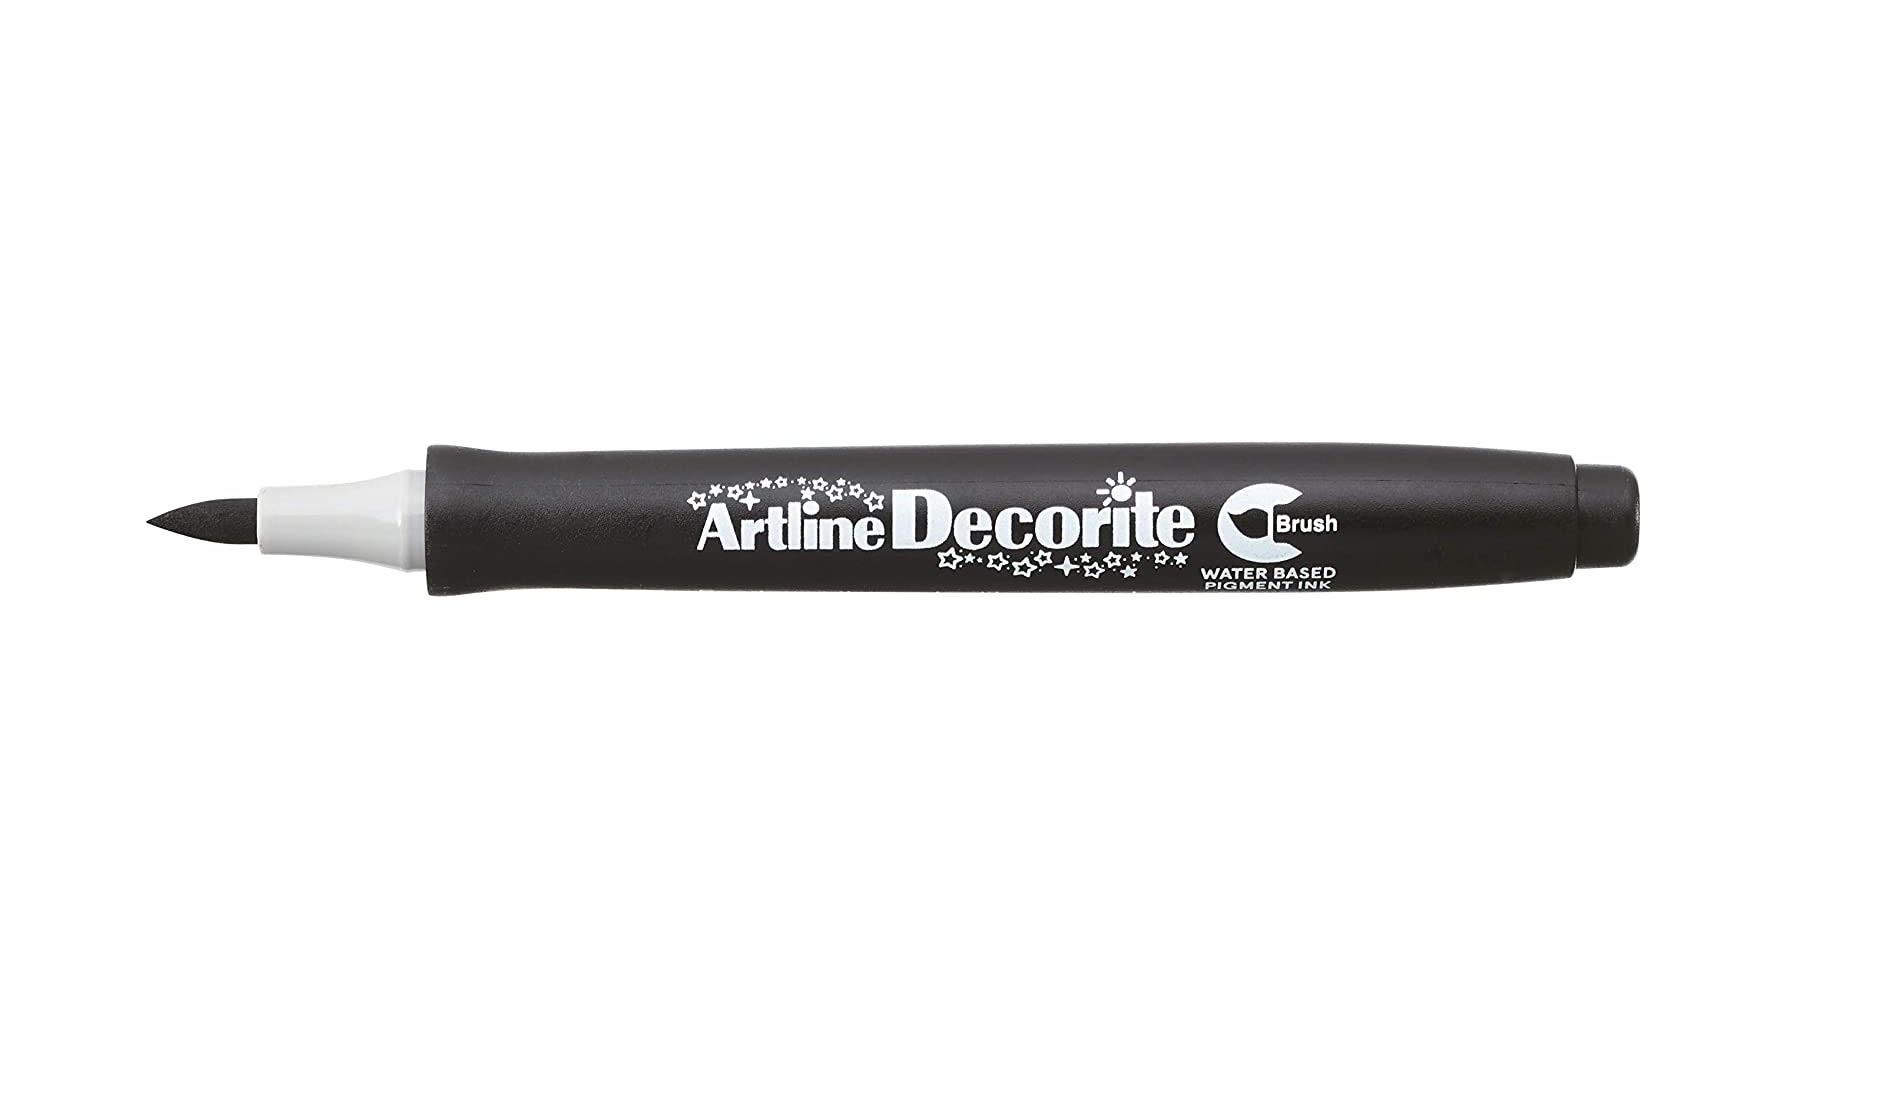 Artline Decorite Brush Marker Pen for Card, Glass, Metal and Plastic (Black)